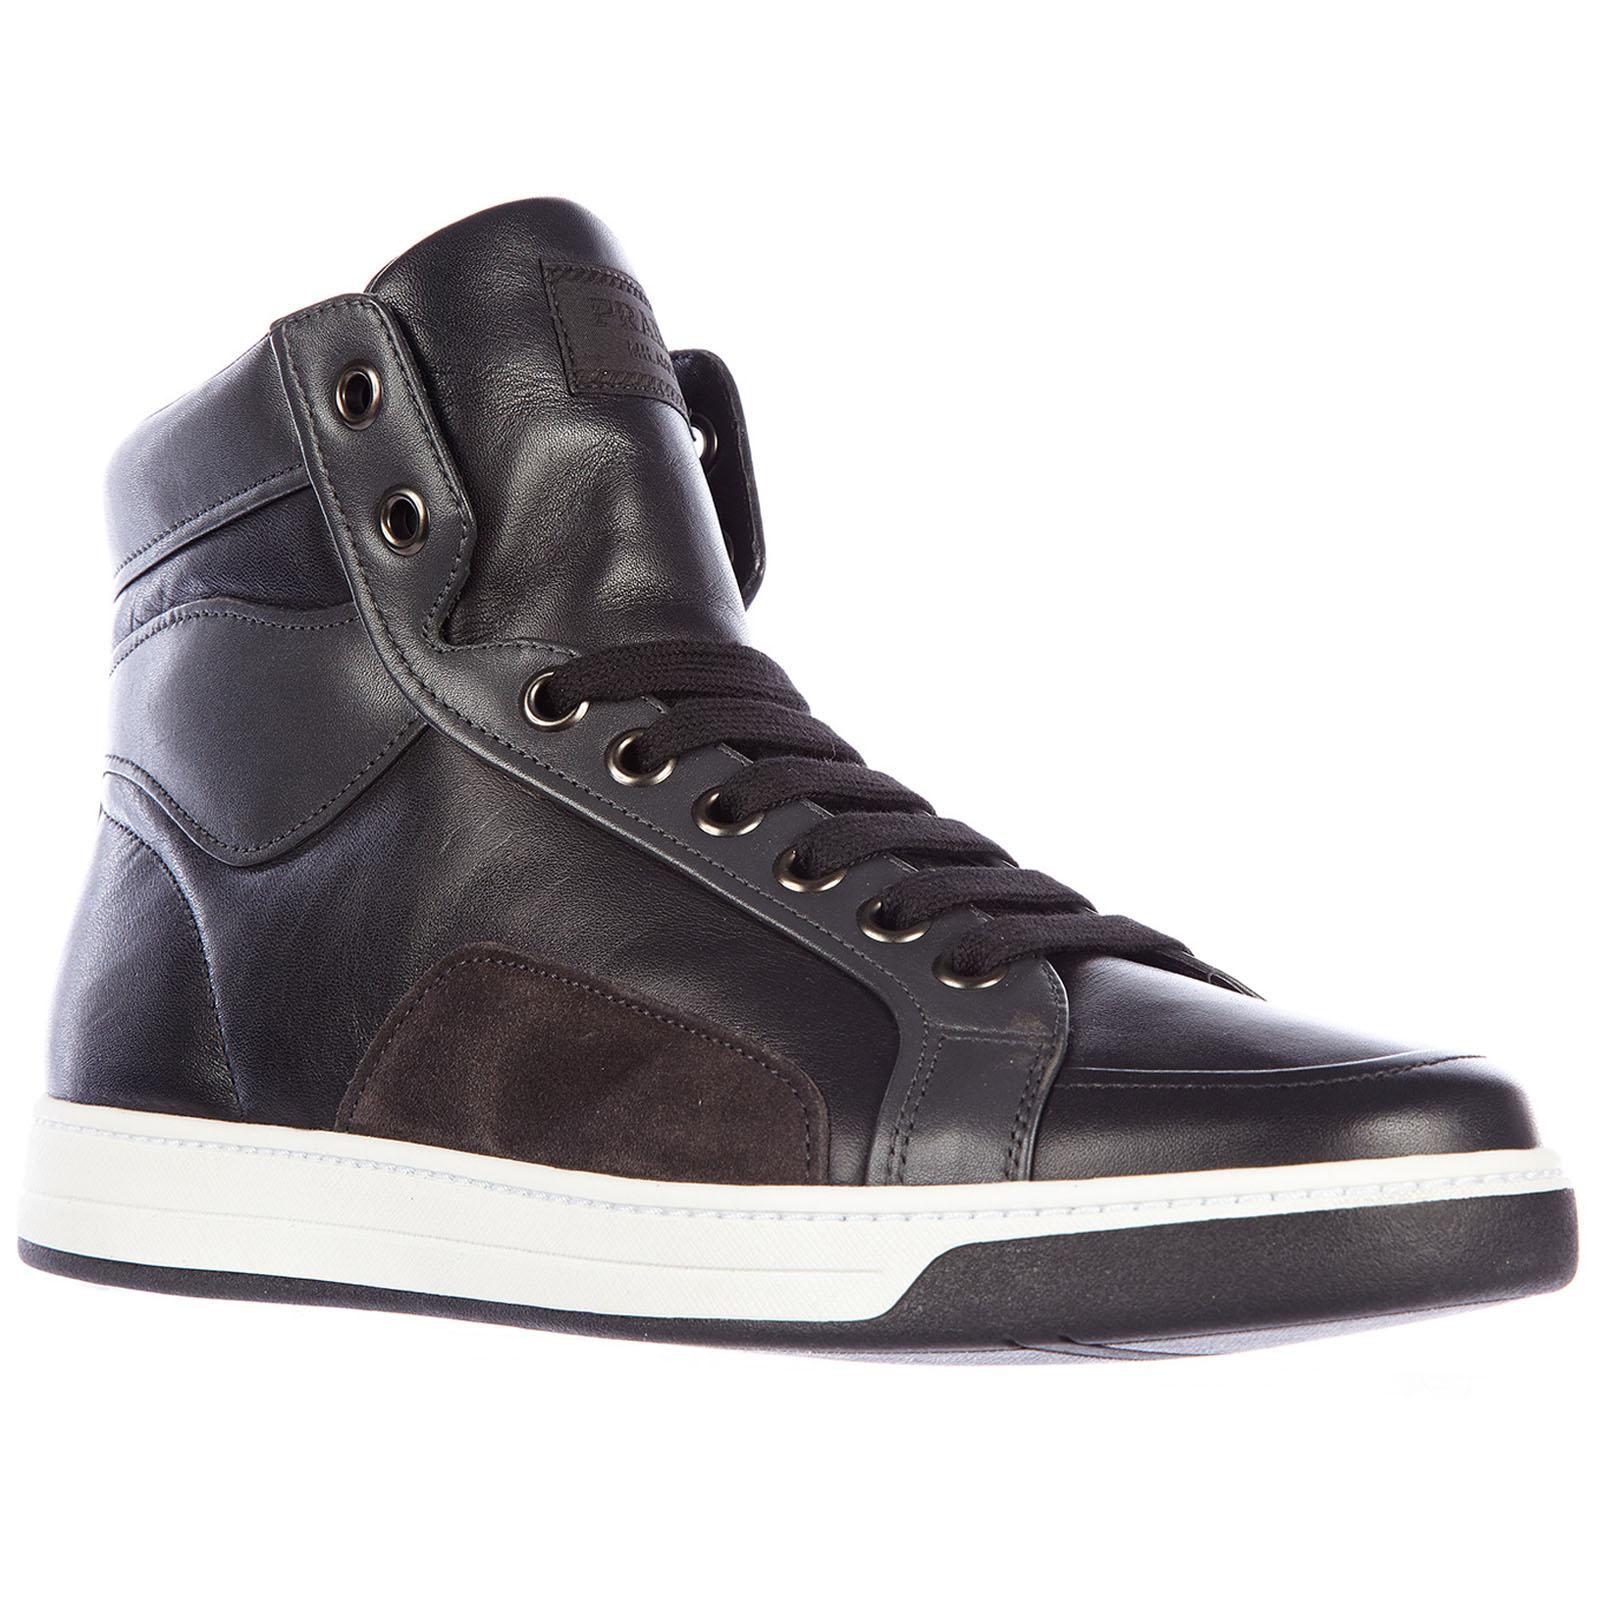 Herrenschuhe herren leder schuhe high sneakers plume color